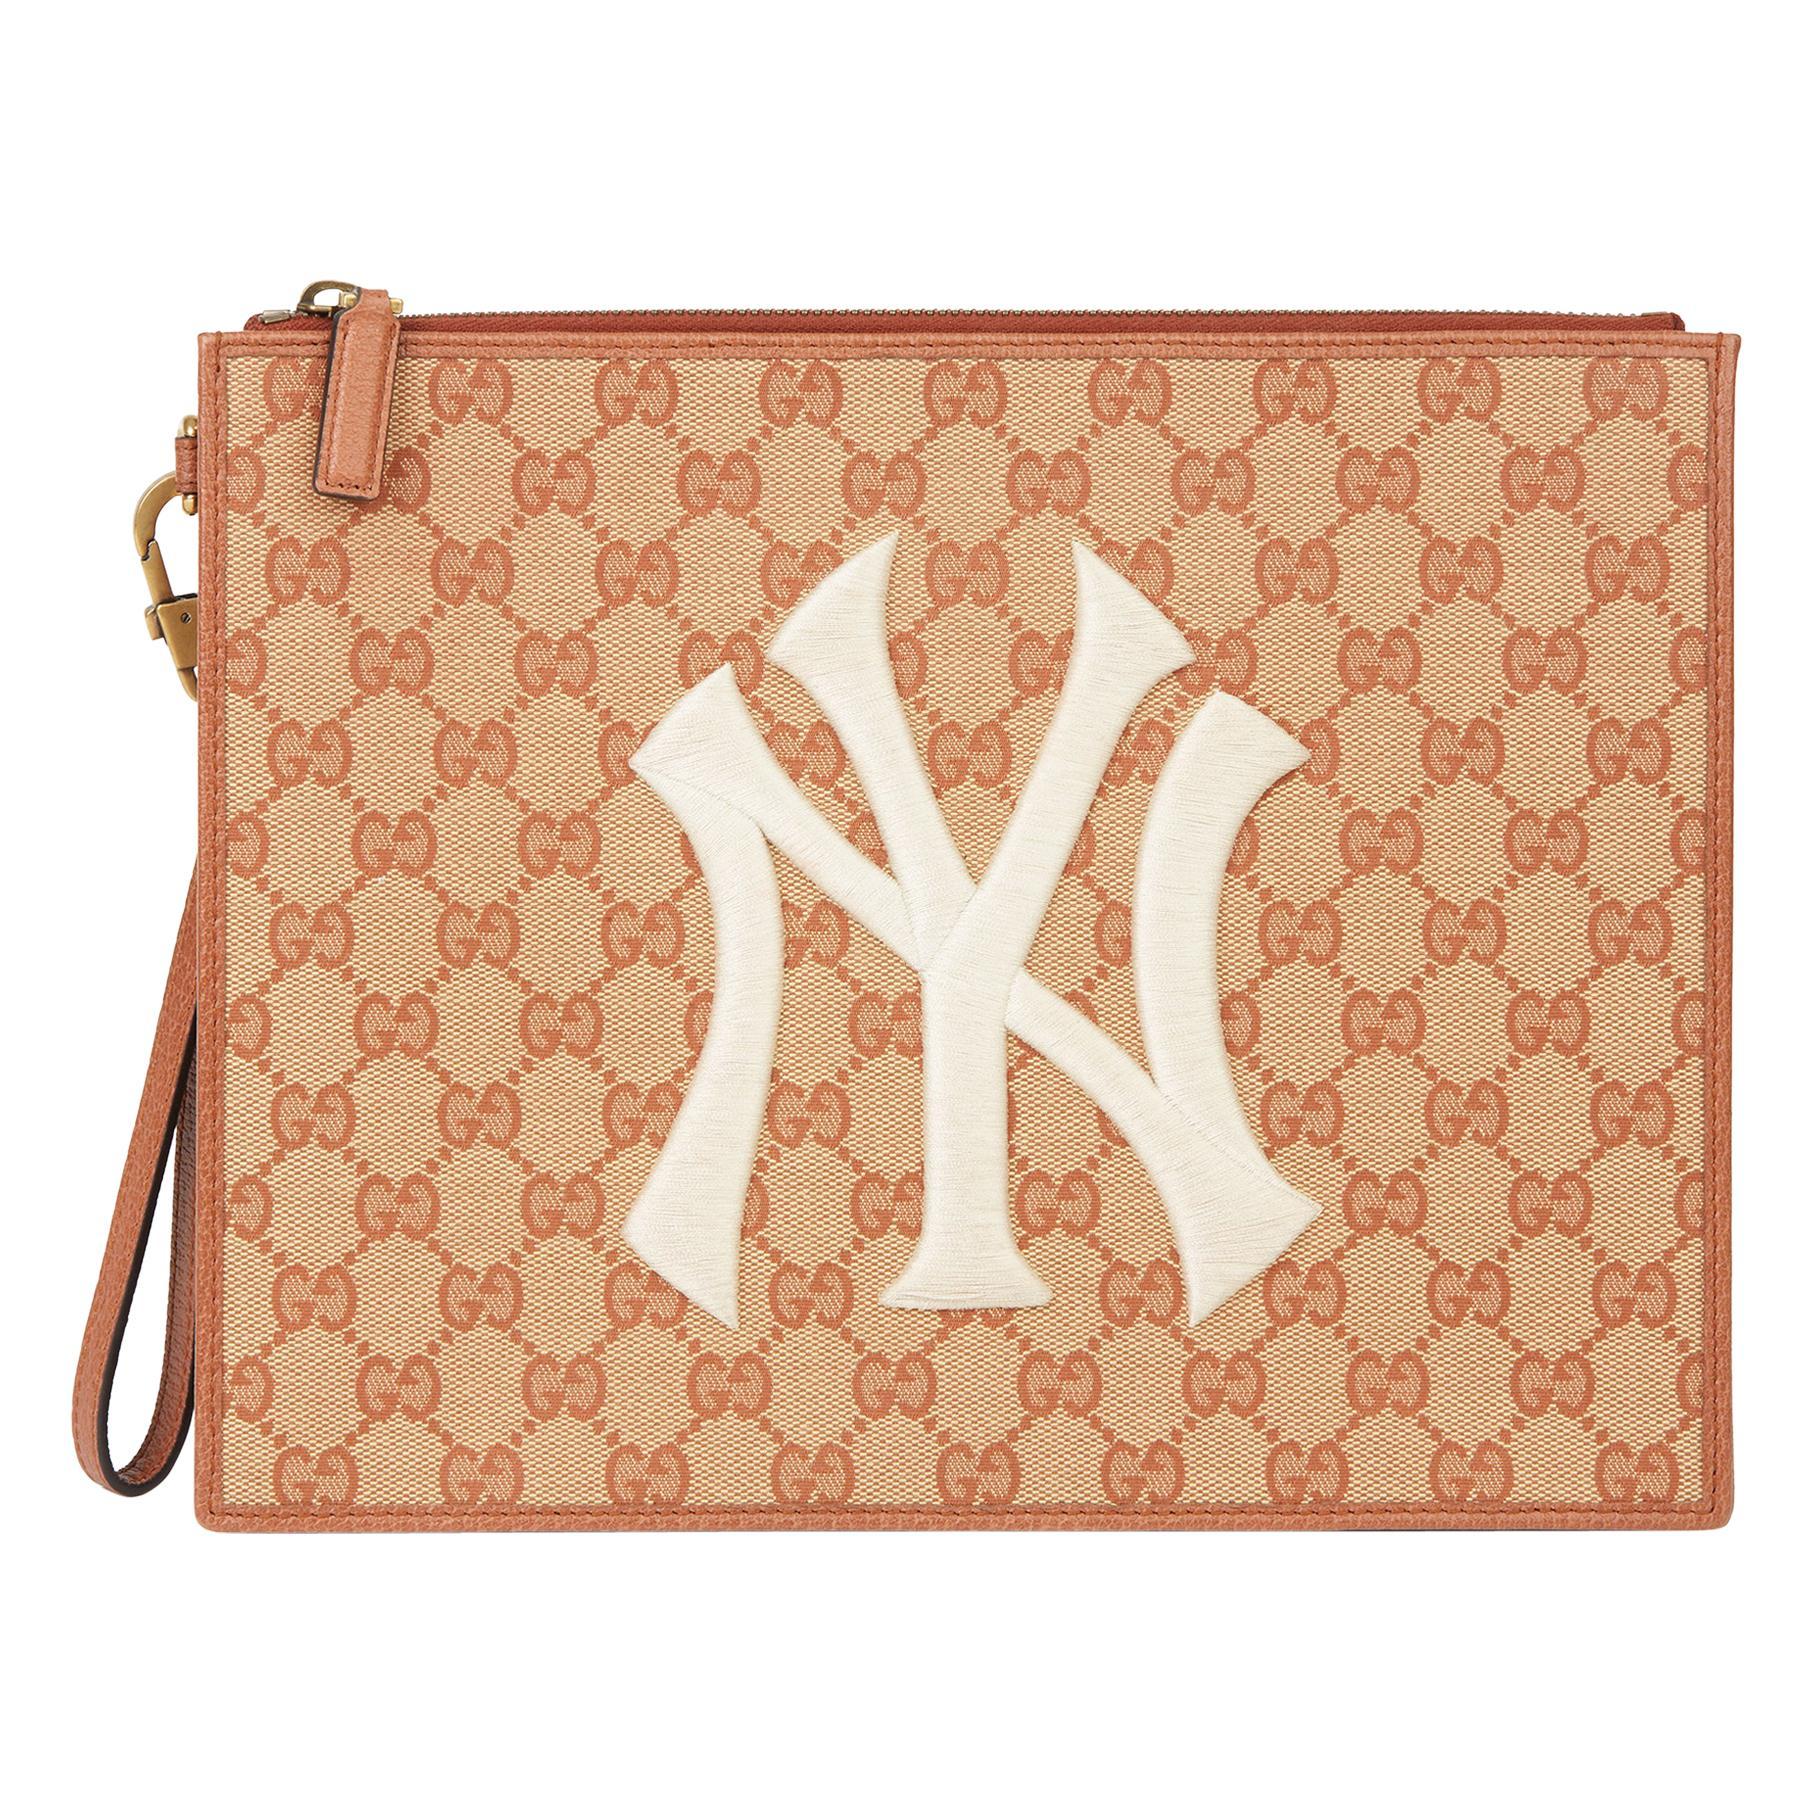 2019 Gucci Brick Monogram Canvas Yankees Pouch